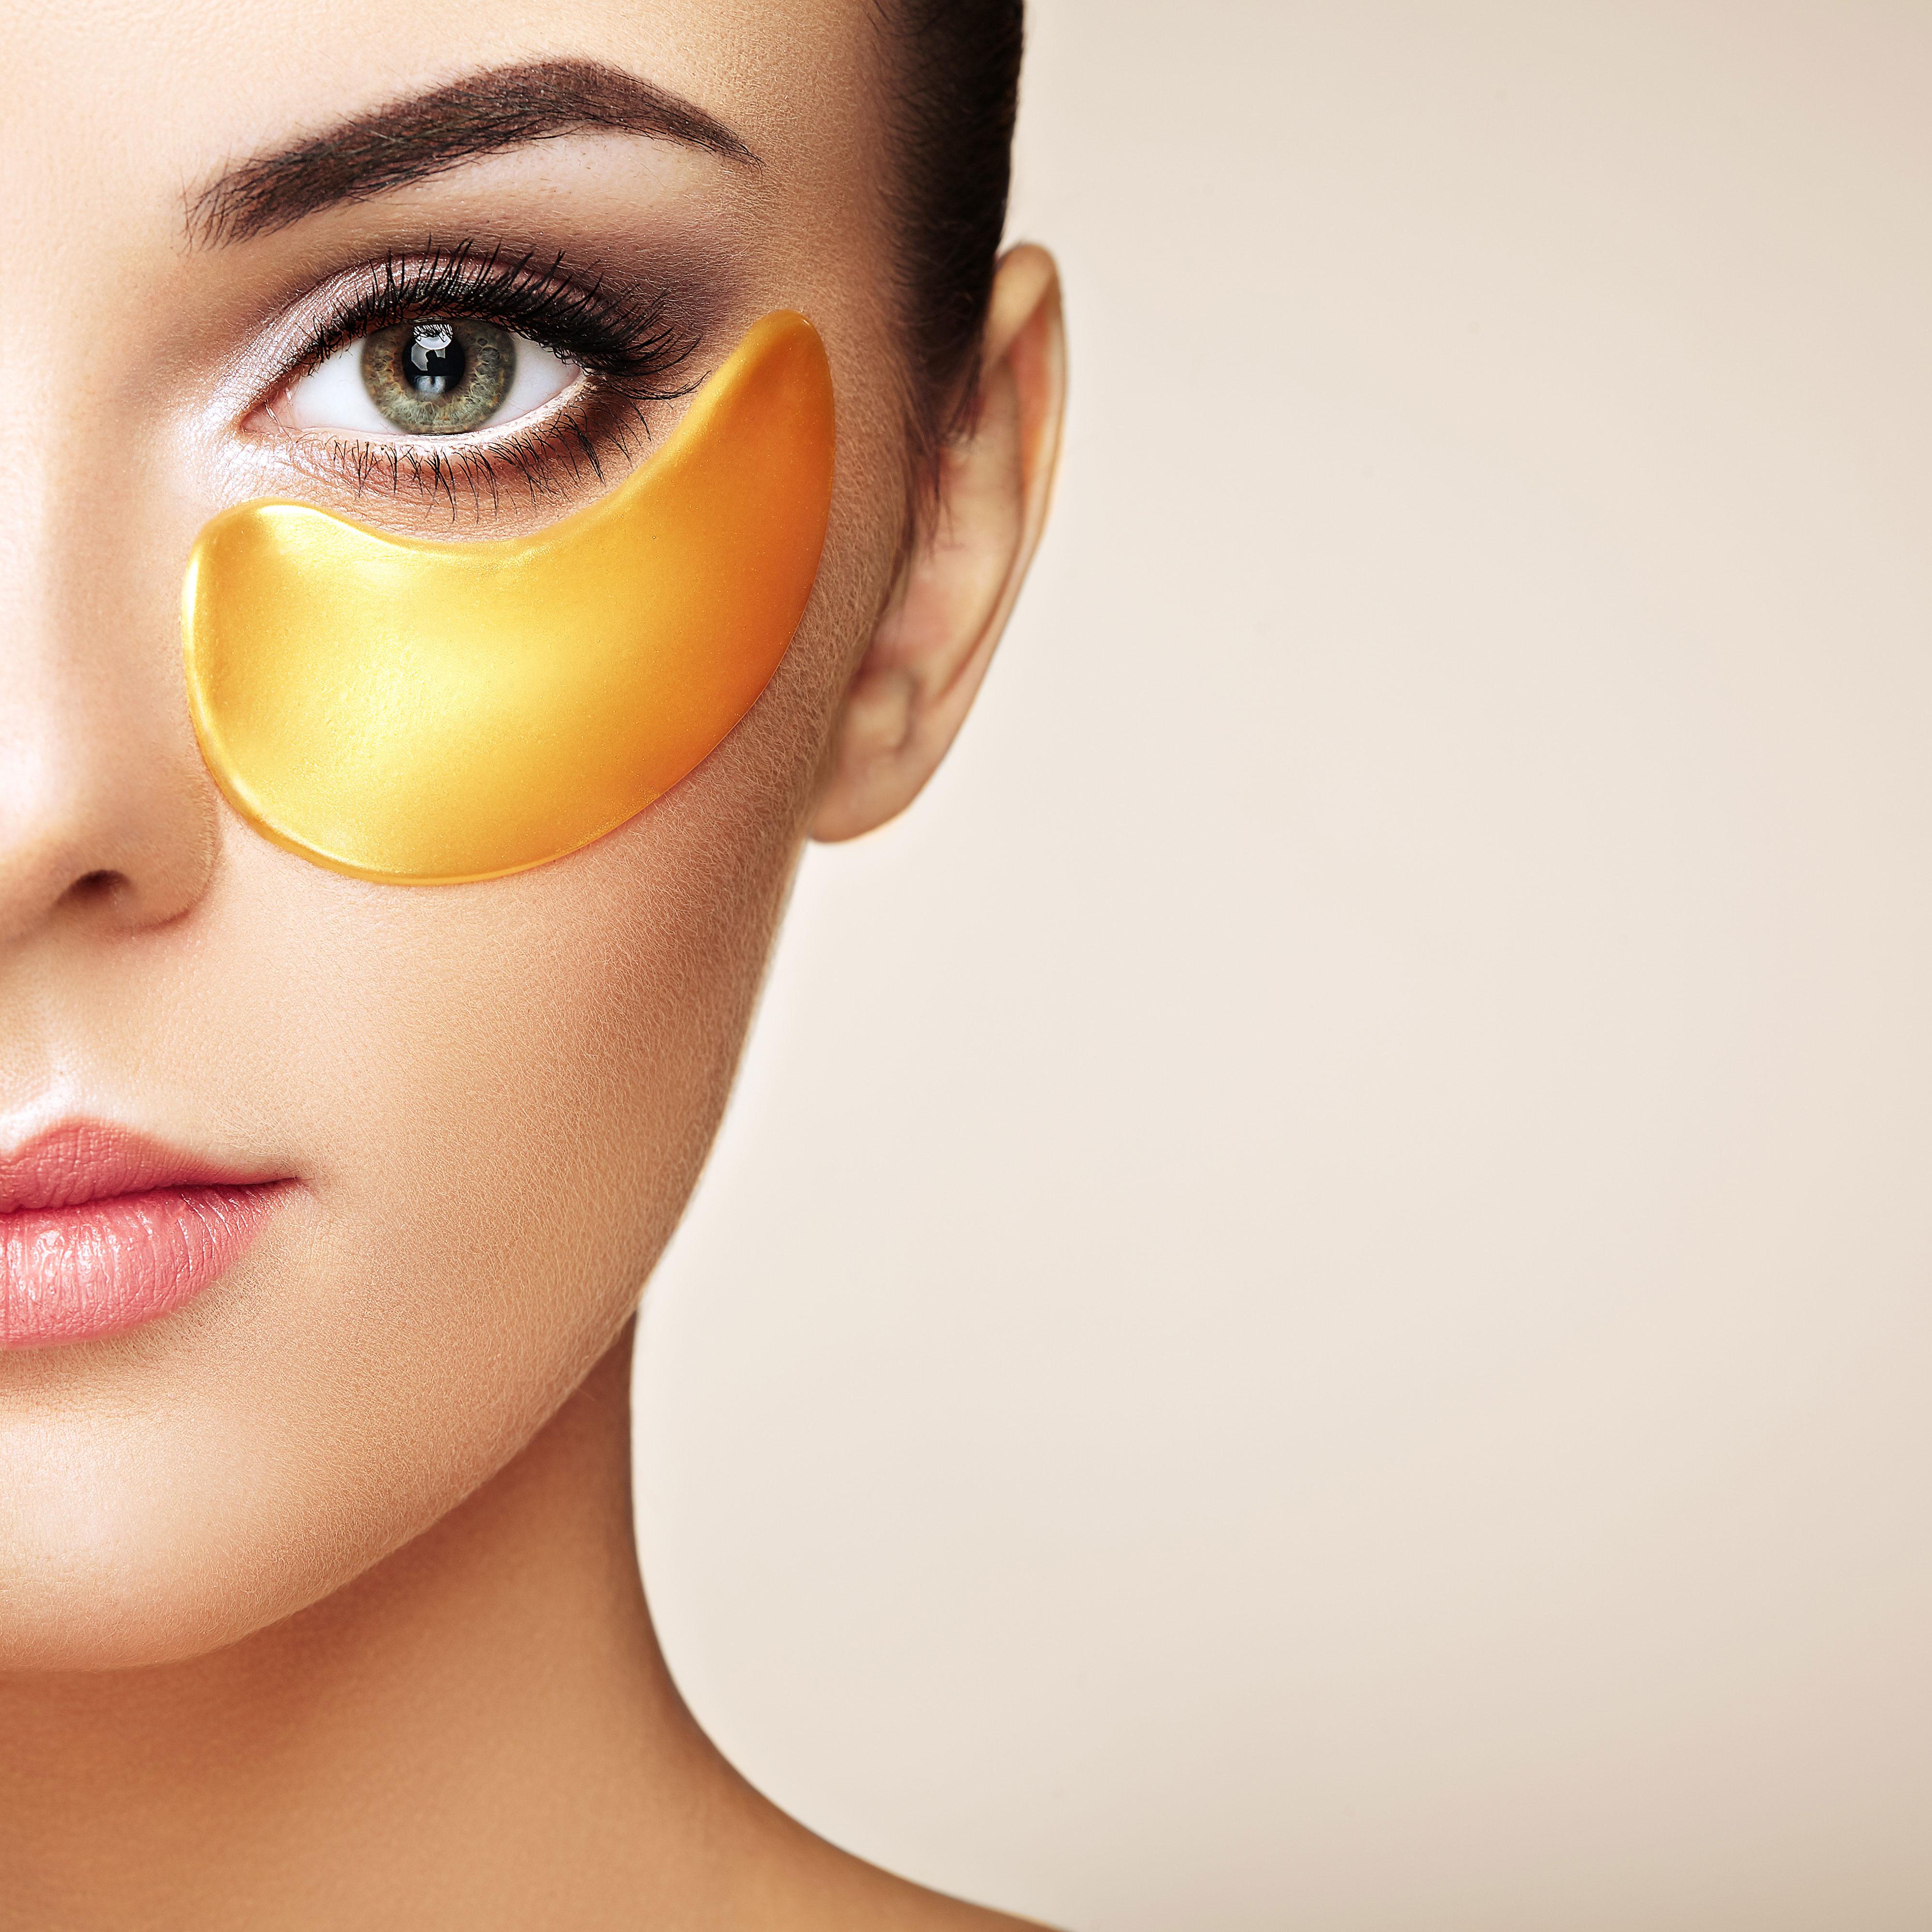 Eye pads: Οι πιο αποτελεσματικές μάσκες ματιών για πιο ξεκούραστο βλέμμα